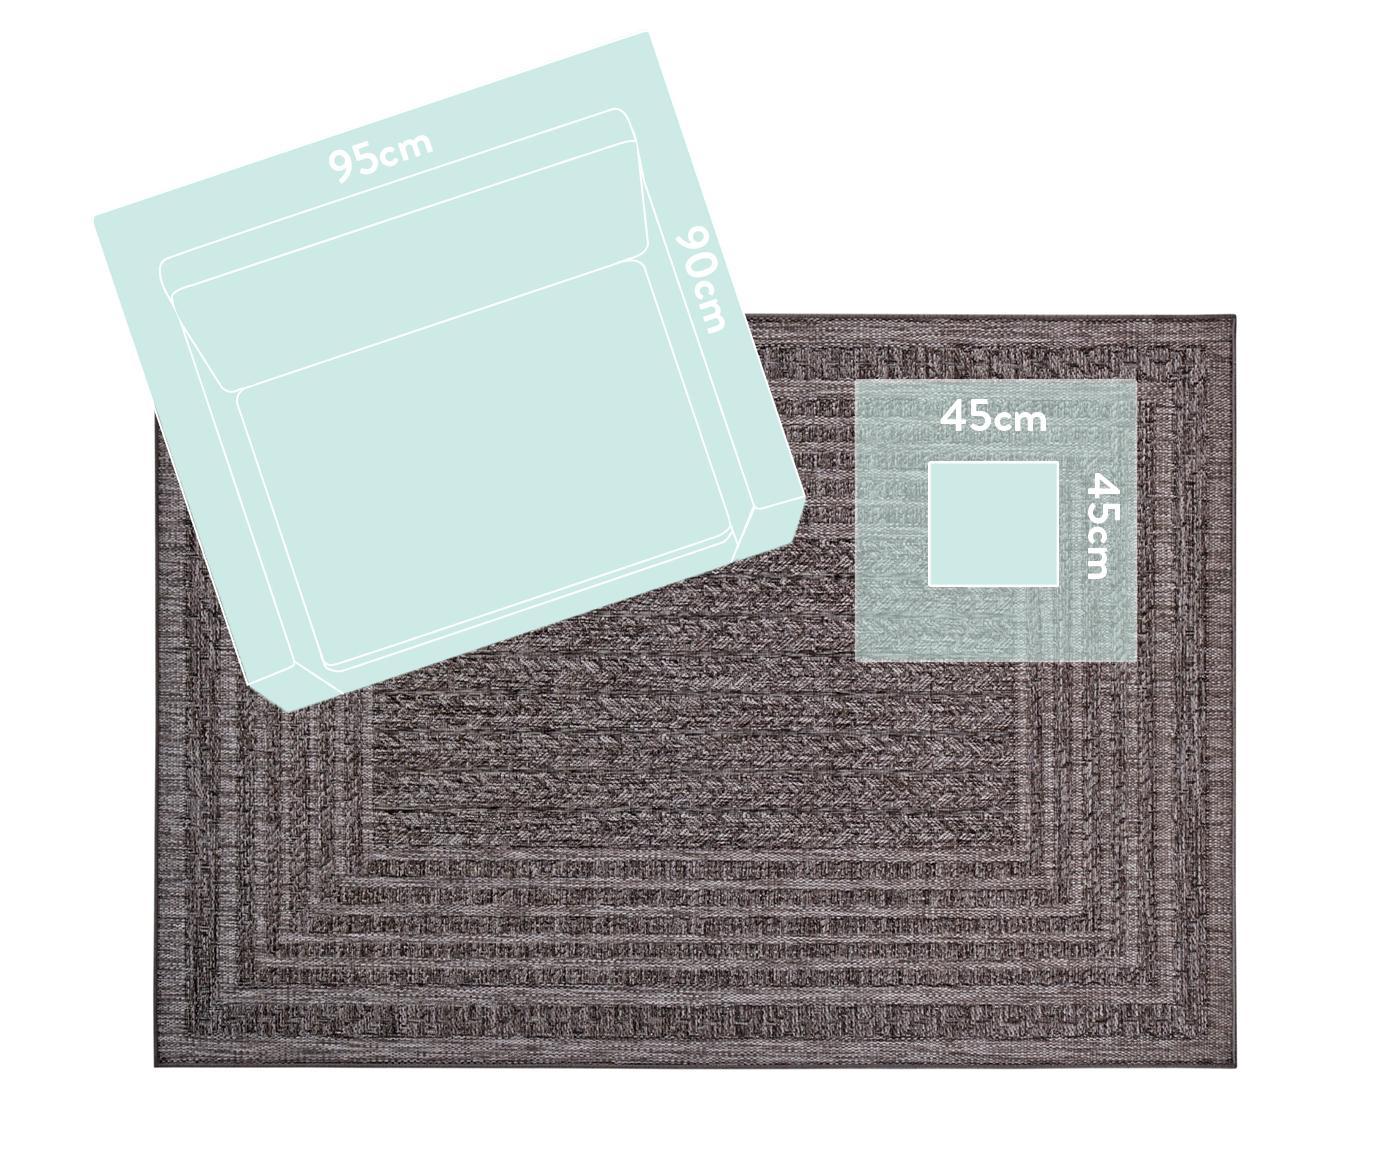 In- & Outdoor-Teppich Limonero in Jute Optik, 100% Polypropylen, Dunkelgrau, B 120 x L 170 cm (Größe S)